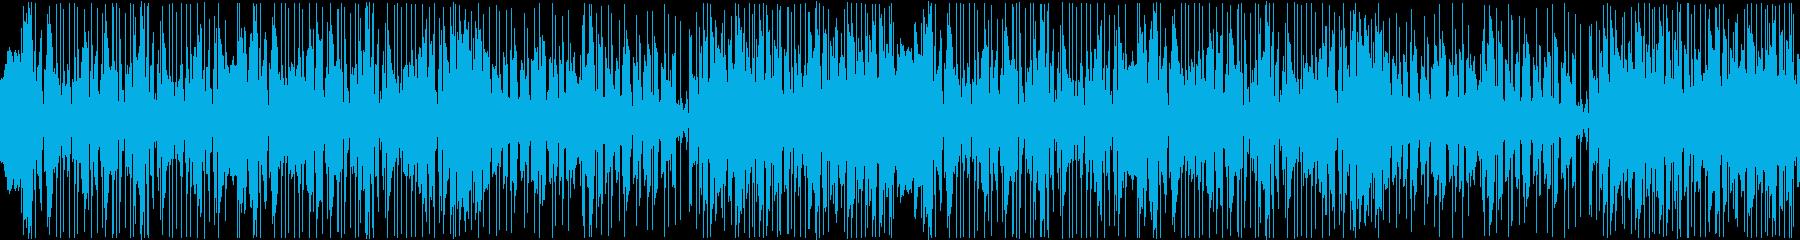 【YouTube】ファンキーな日常曲の再生済みの波形